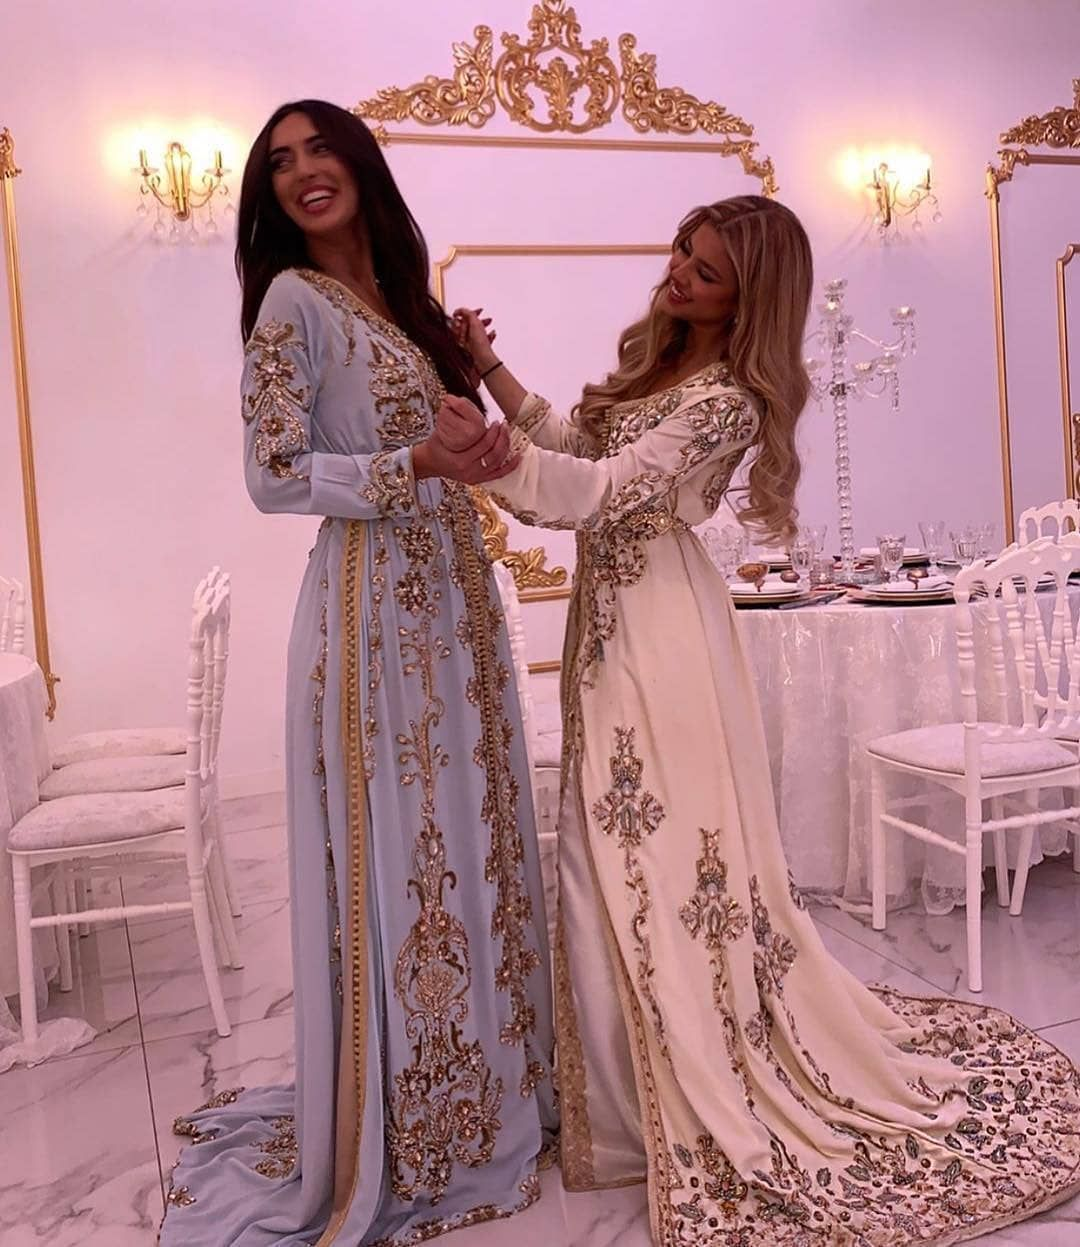 Afbeelding Kan Het Volgende Bevatten 2 Mensen Staande Mensen Kurdische Kleider Hochzeit Afbeelding K In 2020 Kurdische Kleider Afghanische Kleider Arabische Mode